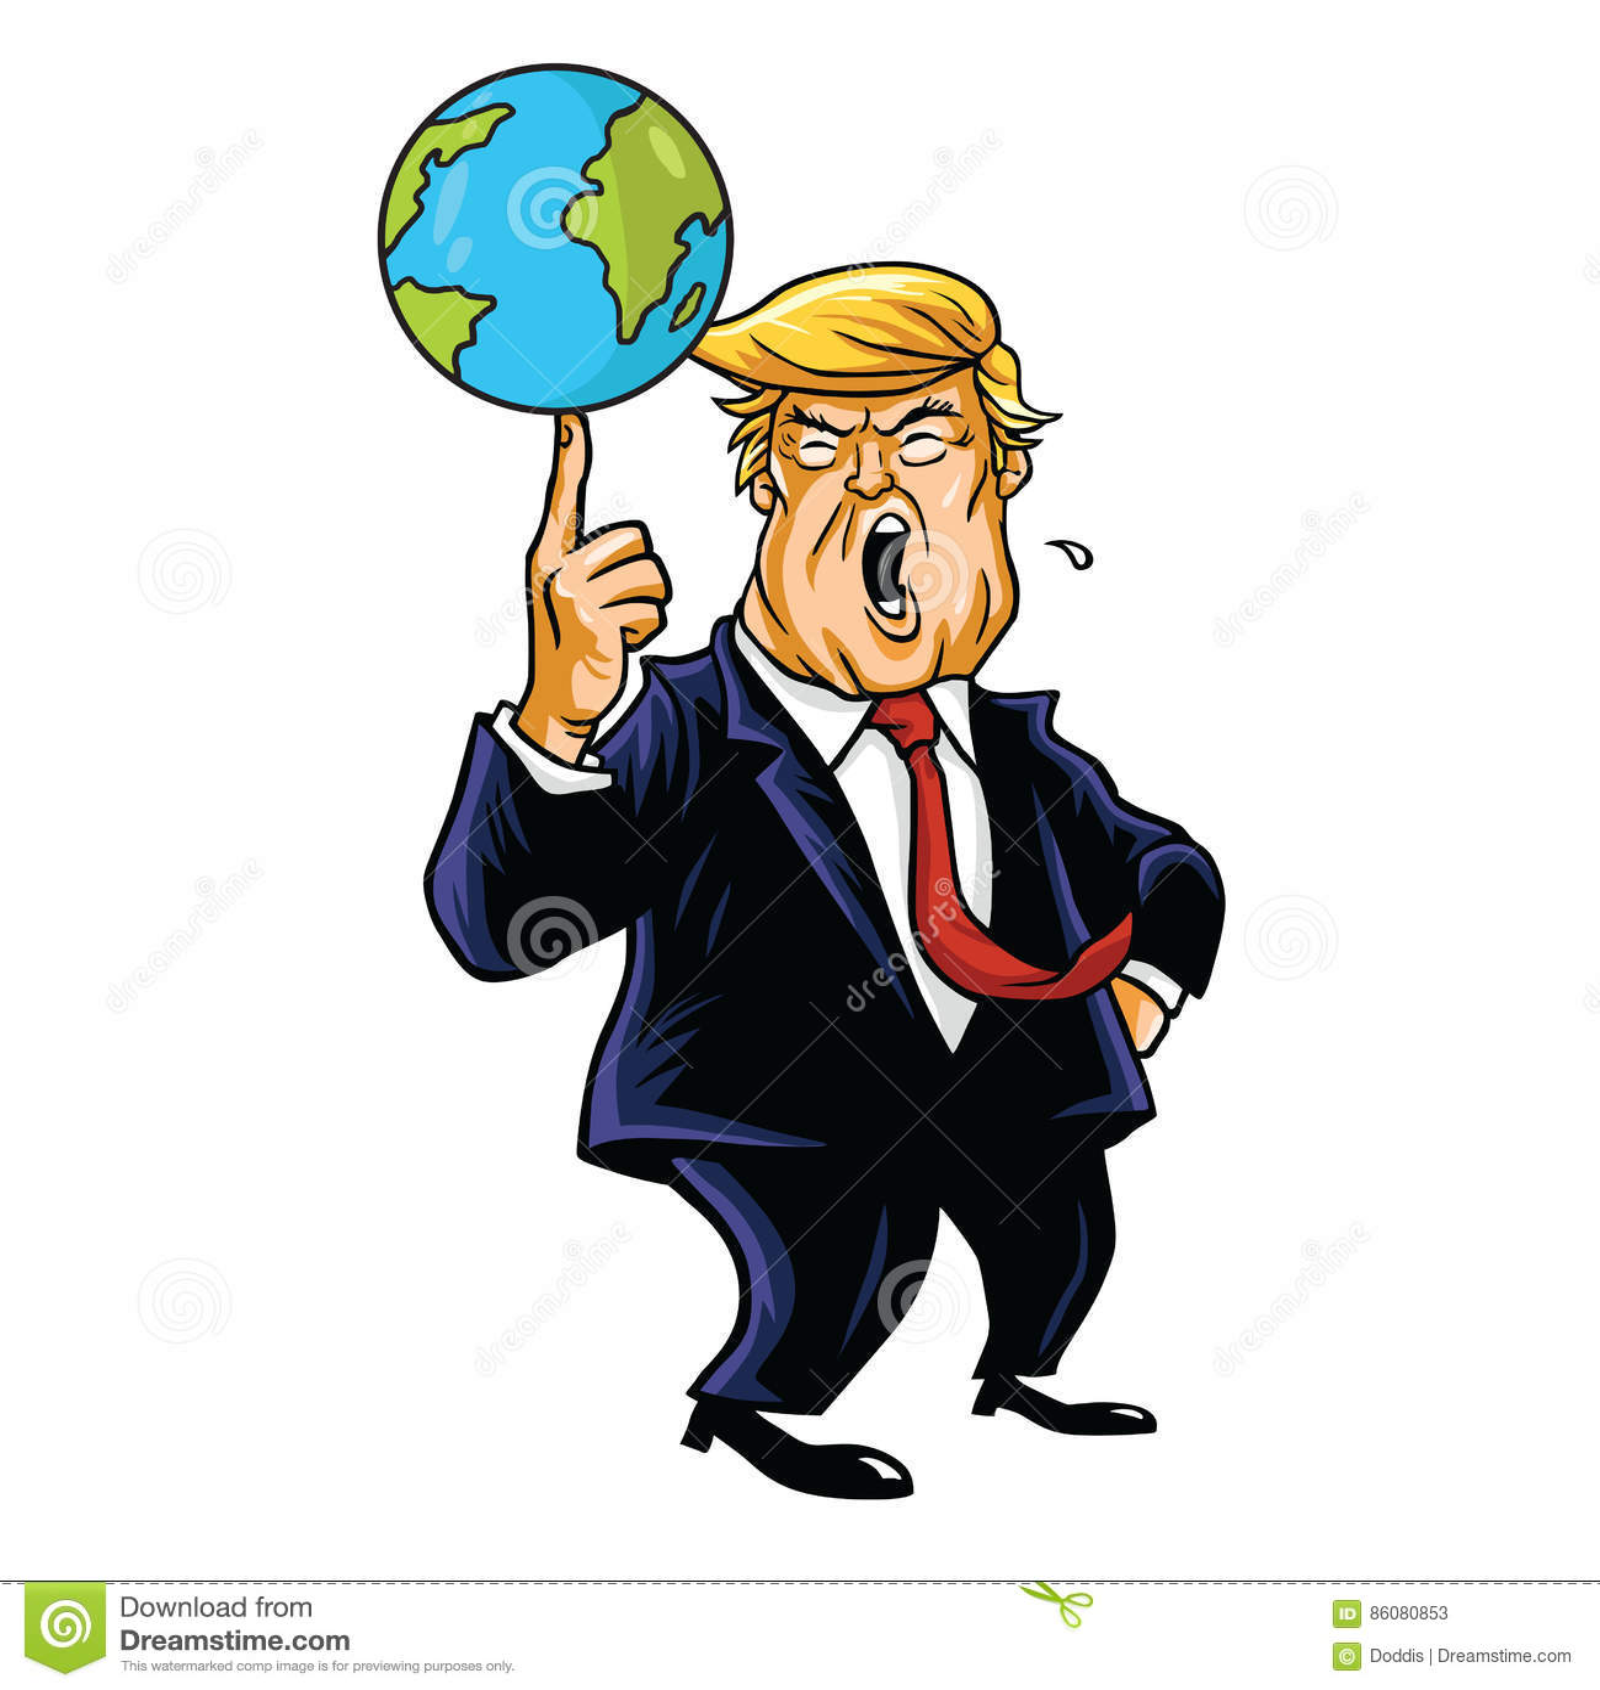 Donald Trump Cartoon Playing Globe Vector Caricature